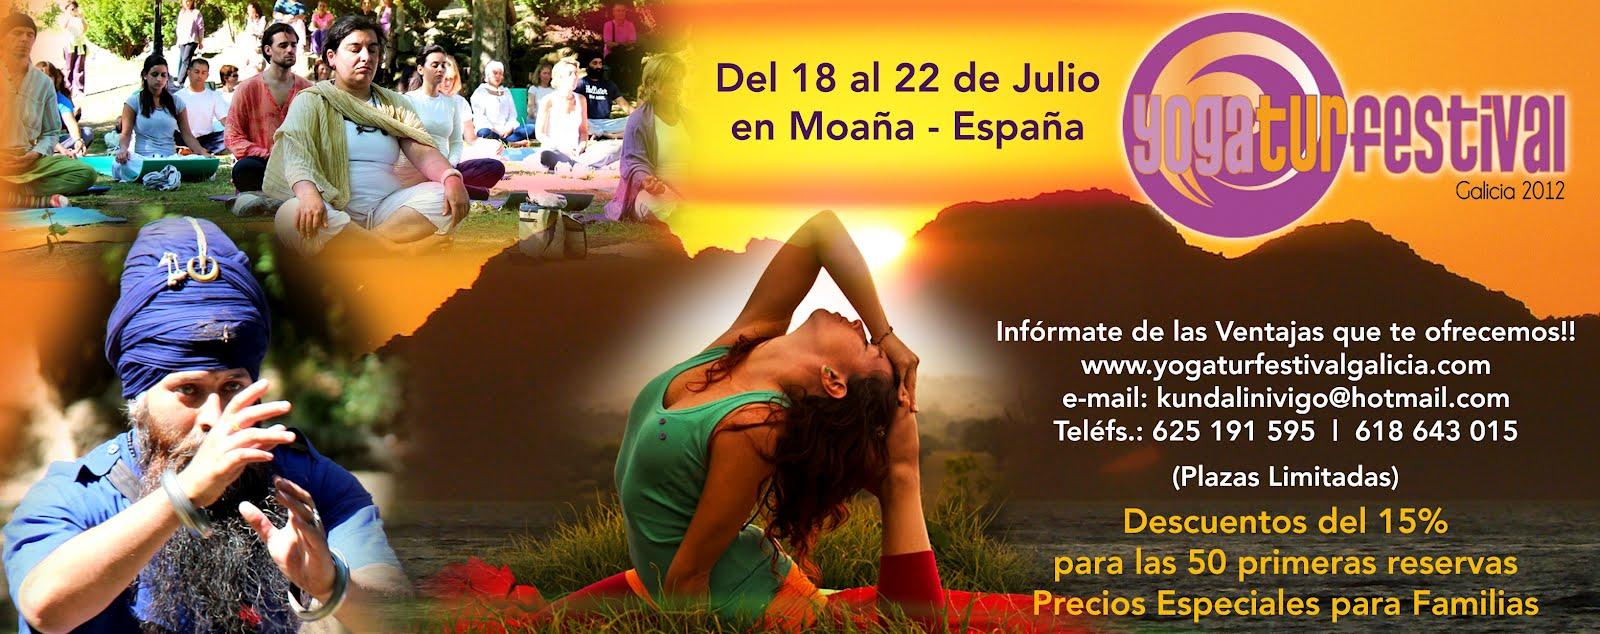 YOGA FESTIVAL GALICIA - YOGATUR 2012 ESPAÑA